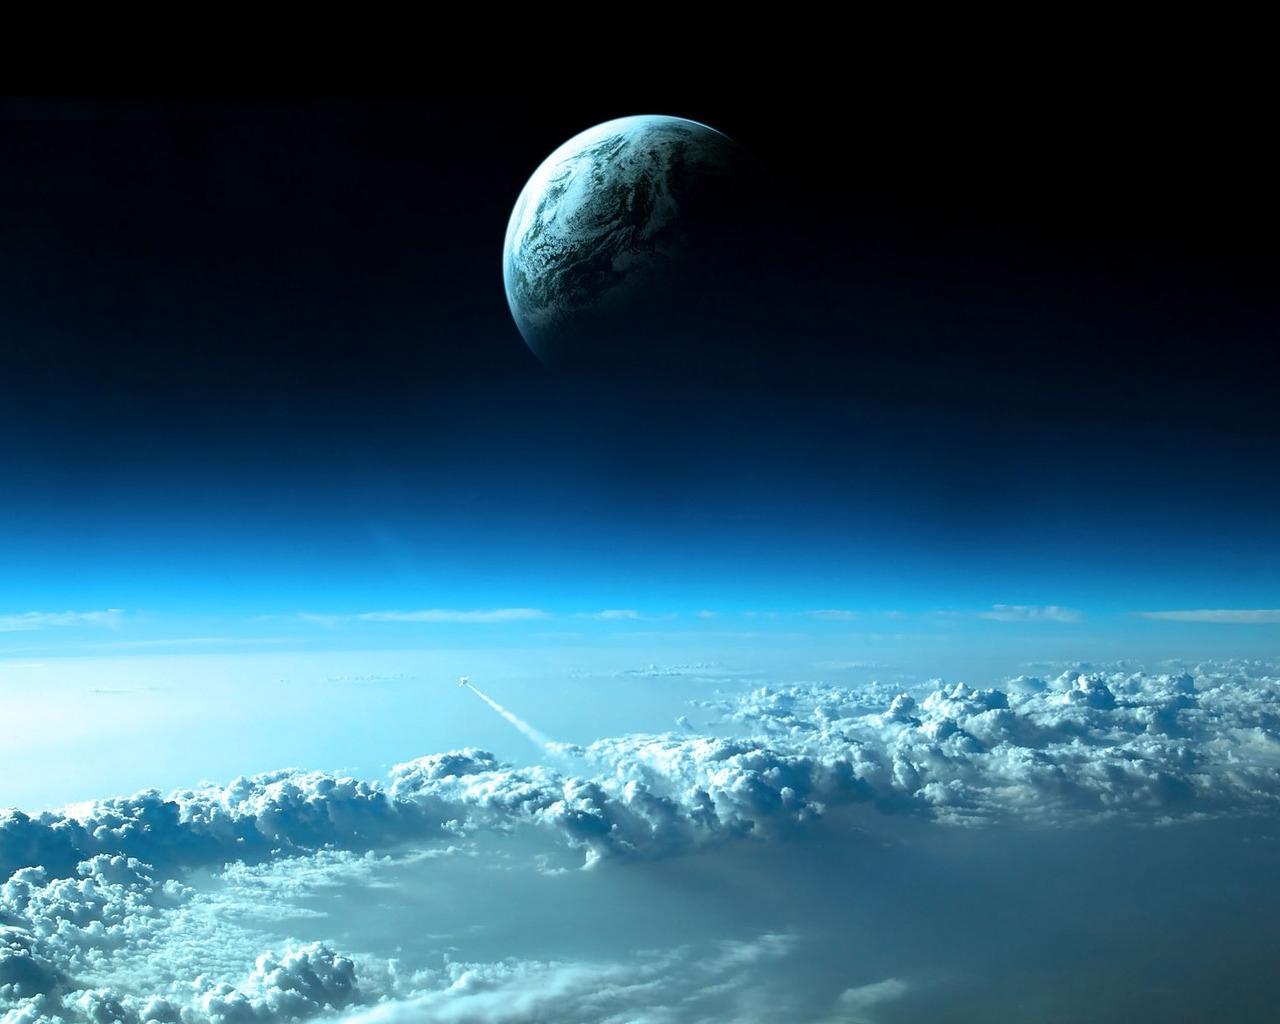 Handy-Wallpaper Landschaft, Sky, Planets kostenlos herunterladen.